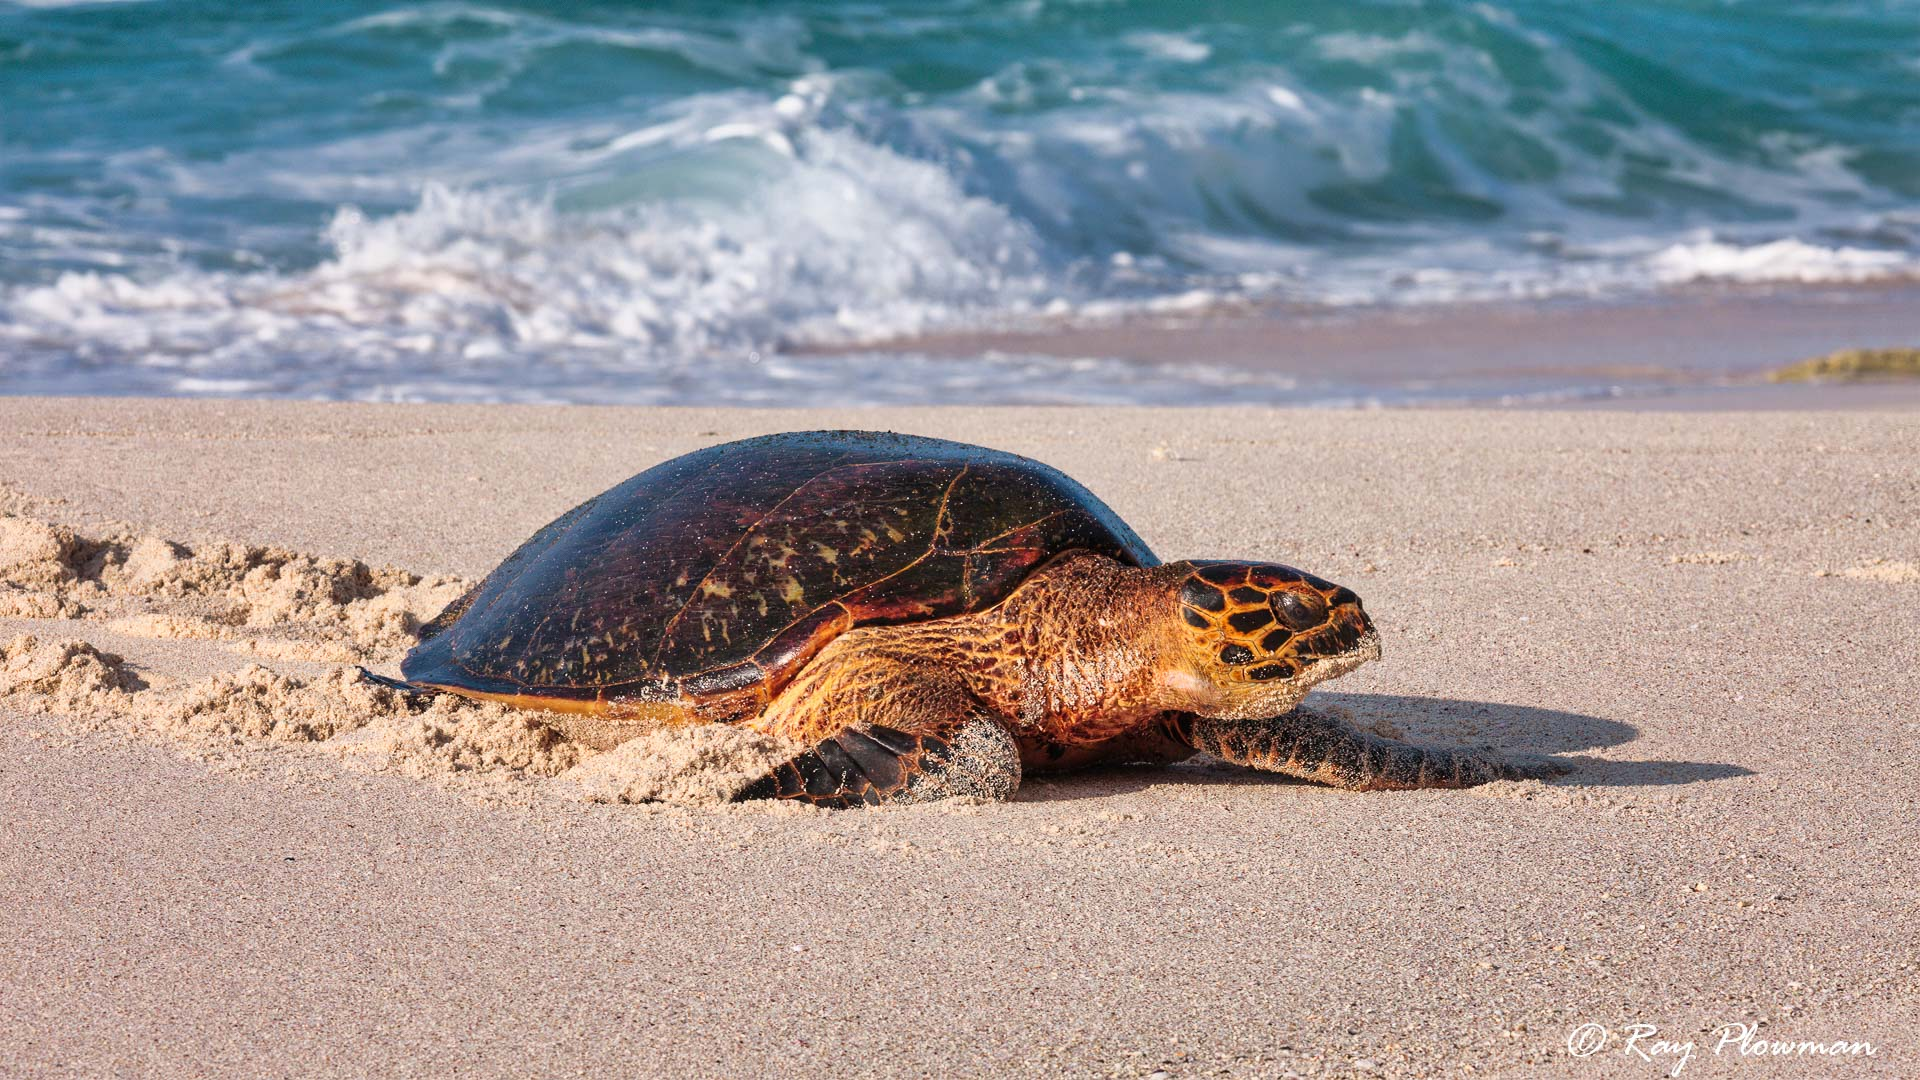 Hawksbill Turtle (Eretmochelys imbricata) climbing up the beach on Mahé Islands Anse Bazarca beach in Seychelles